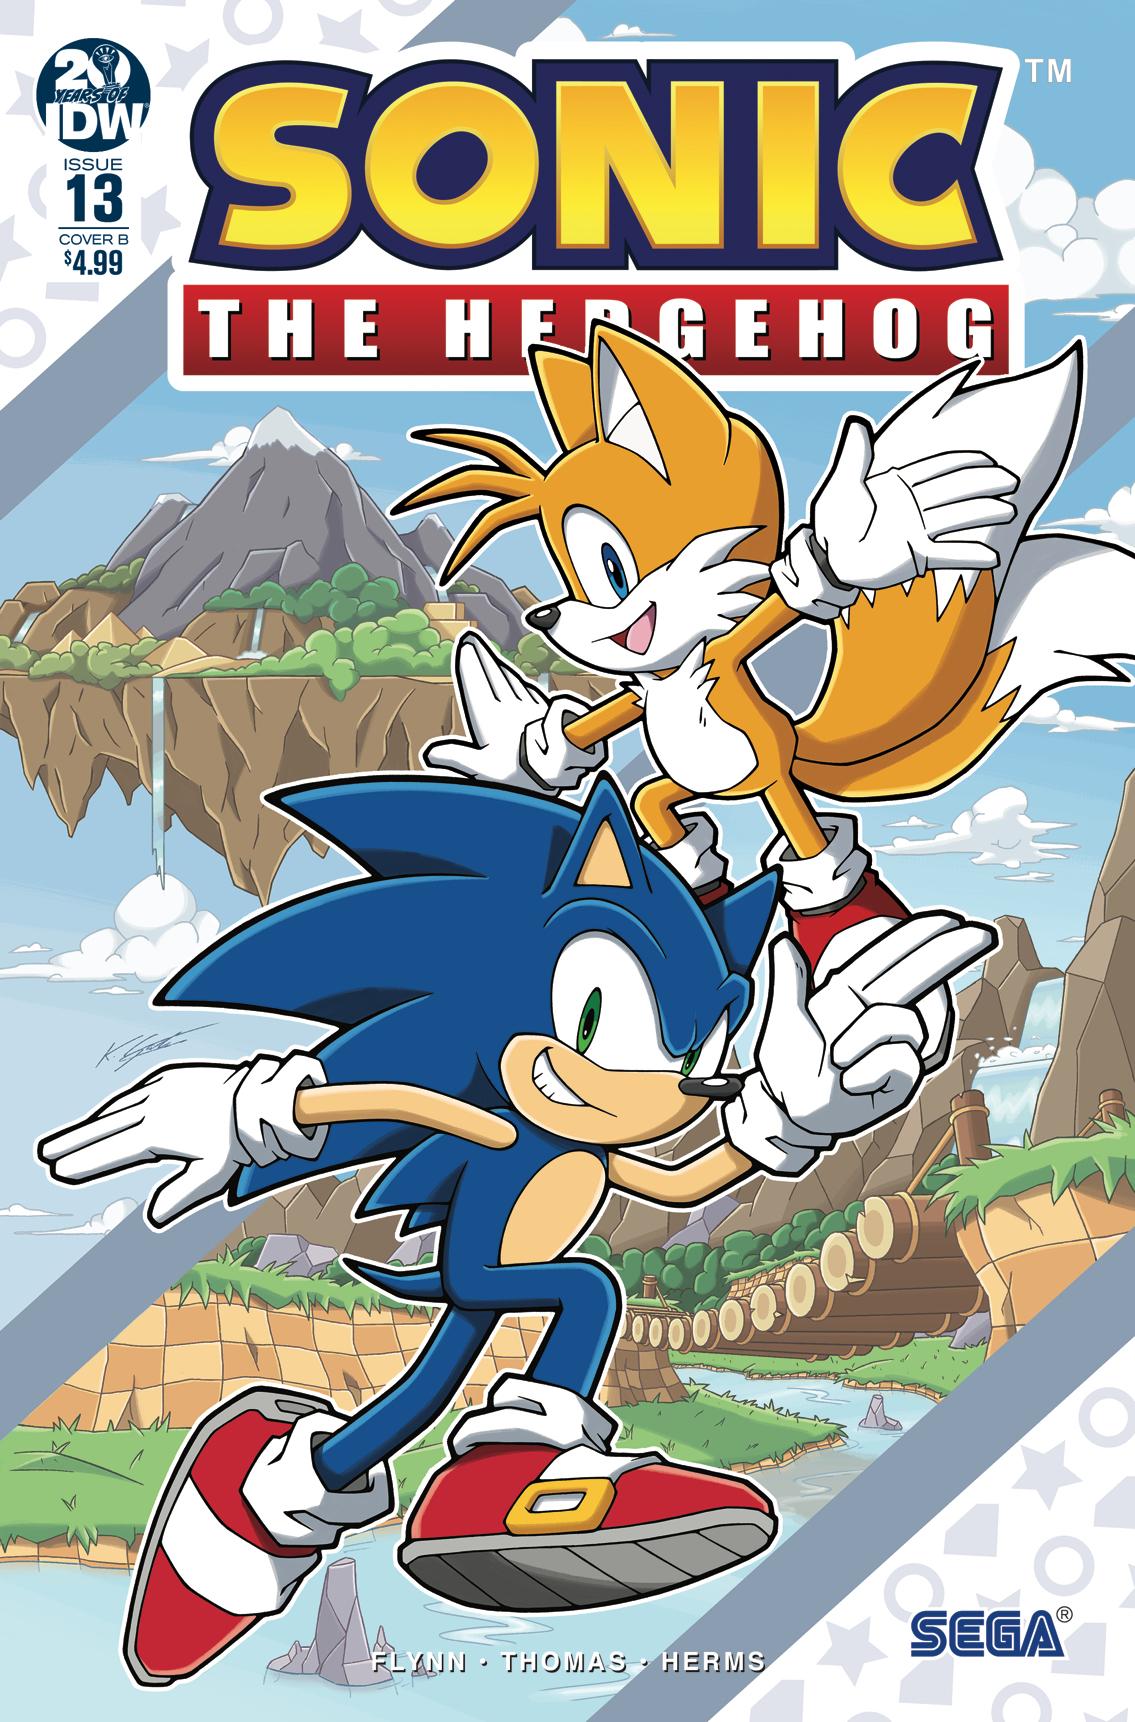 Idw Sonic The Hedgehog Issue 13 Sonic News Network Fandom